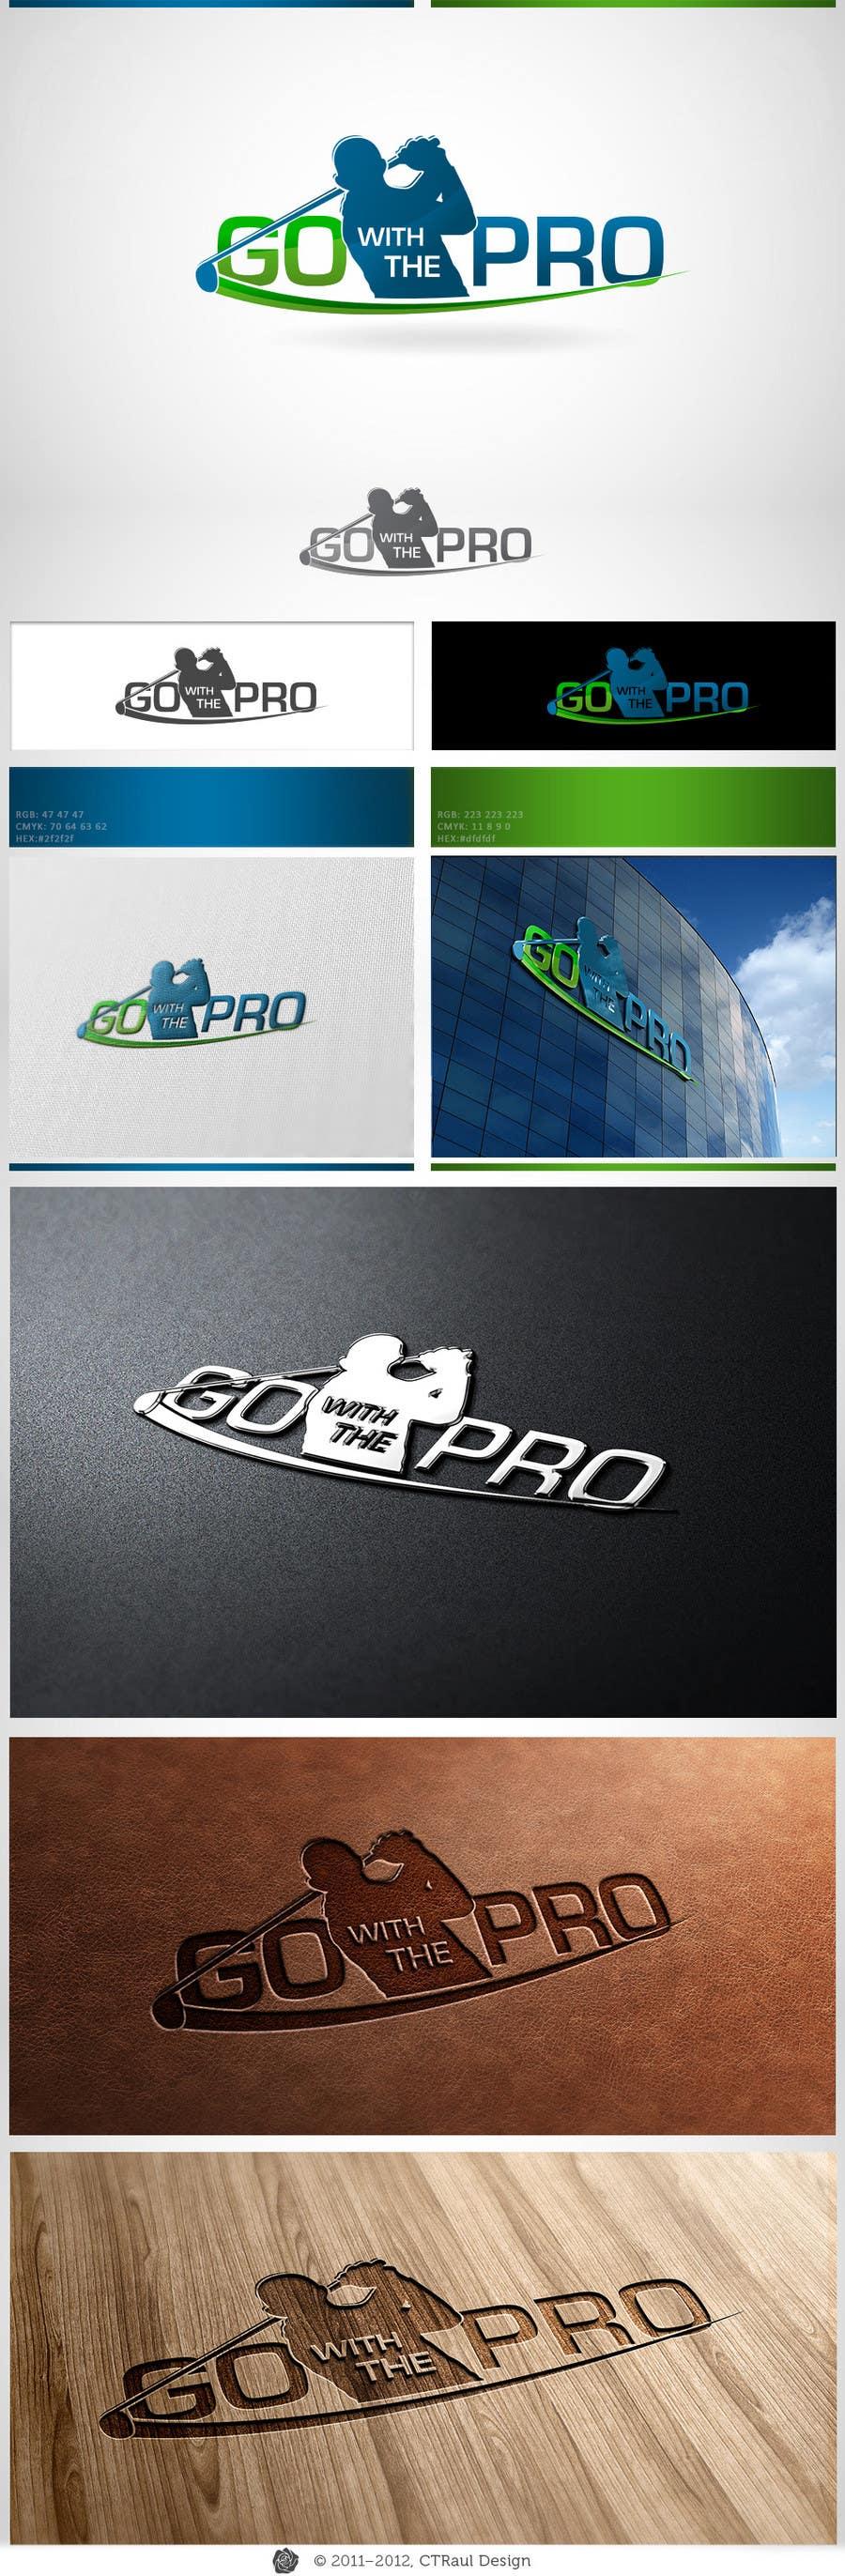 Penyertaan Peraduan #109 untuk Logo Design for Go With The Pro